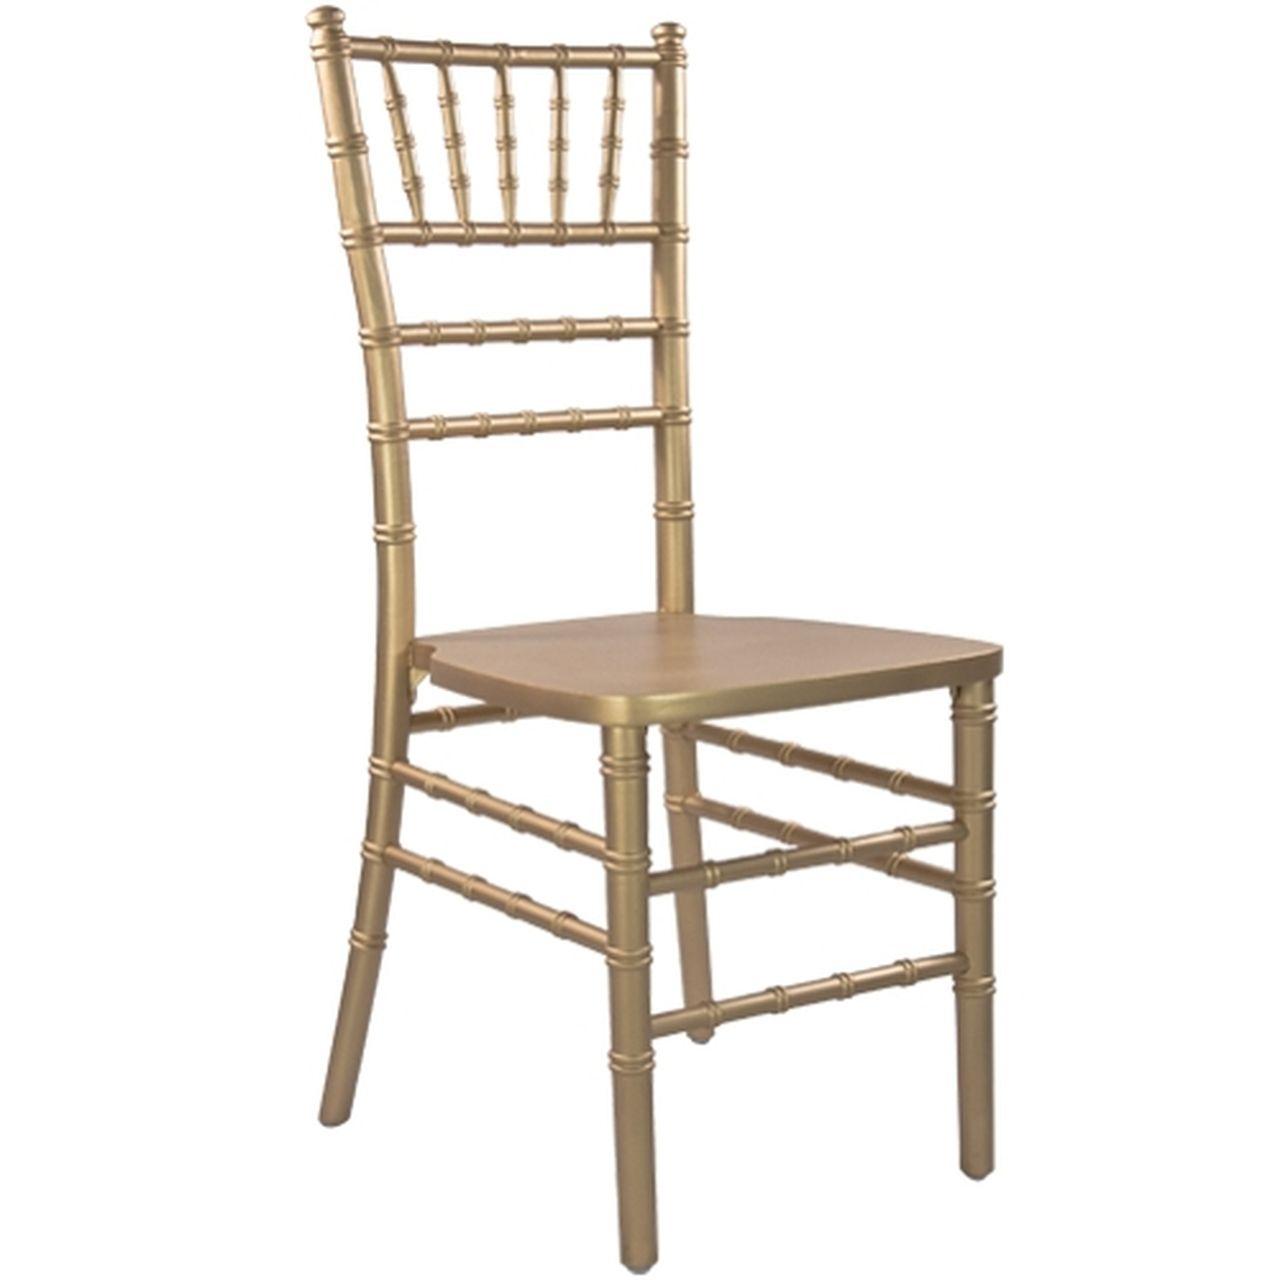 Advantage gold wood chiavari chair wdchig gold